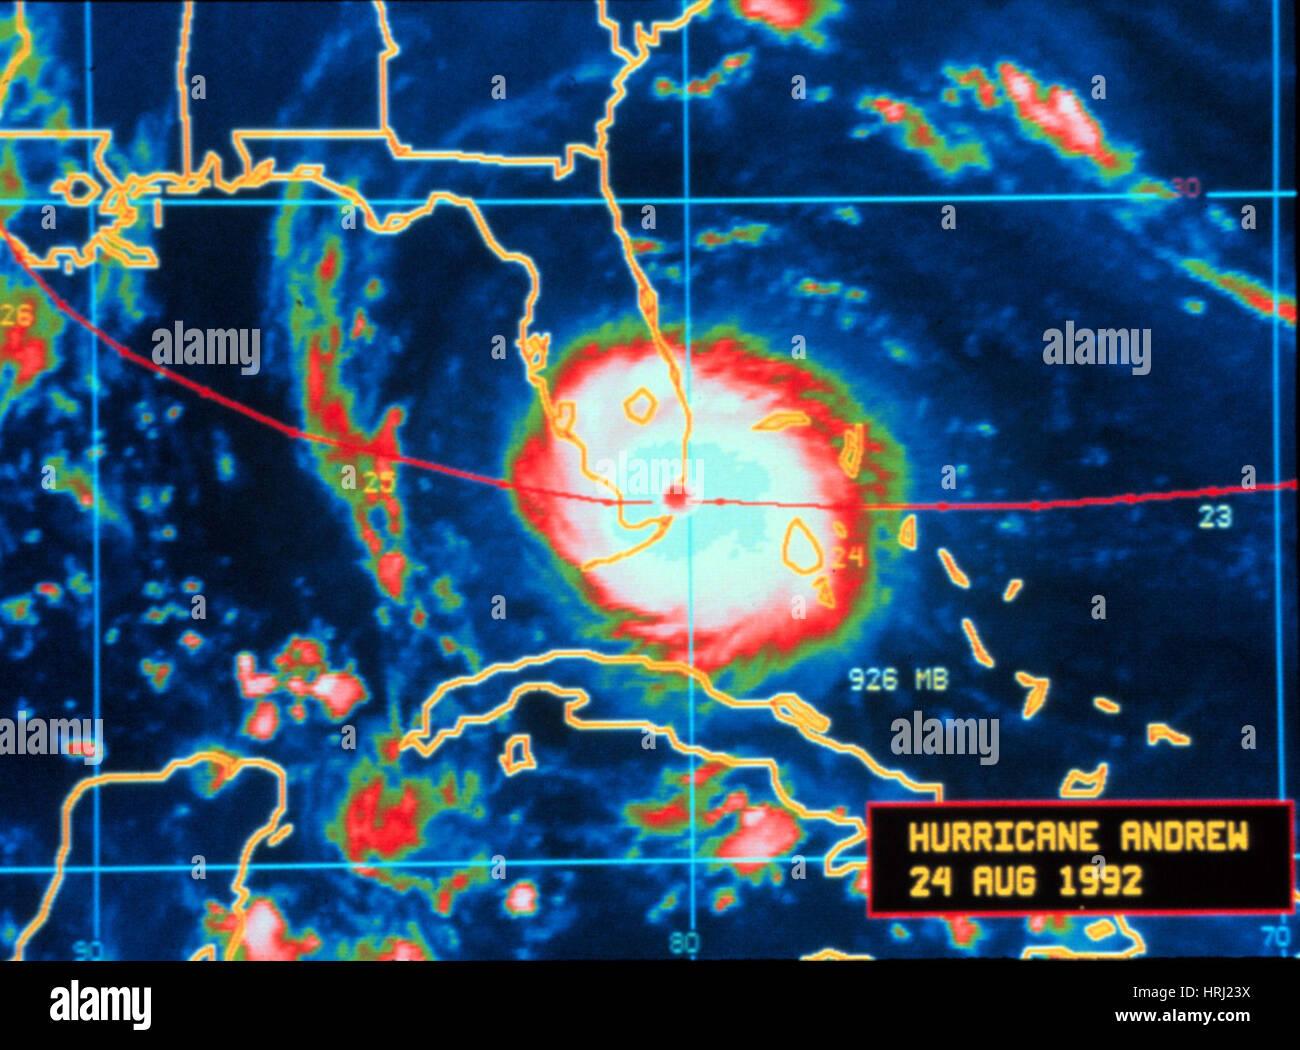 Hurricane Andrew, Infrared Image, 1992 - Stock Image